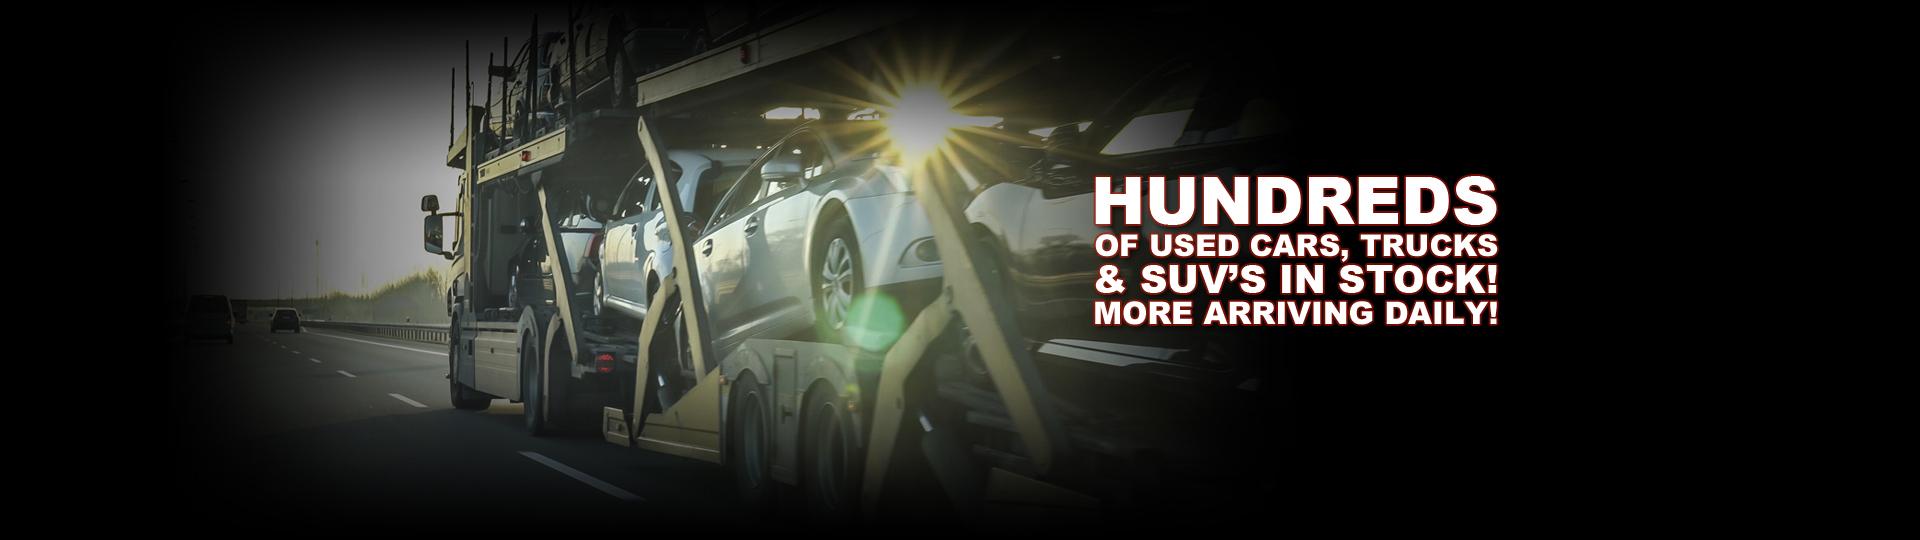 https://x-assets.autorevo-powersites.com/content/assets/clients/2215de71-f467-425e-b70e-351248ec9e4f/5-truck-carrying-cars-with-sunlight-final